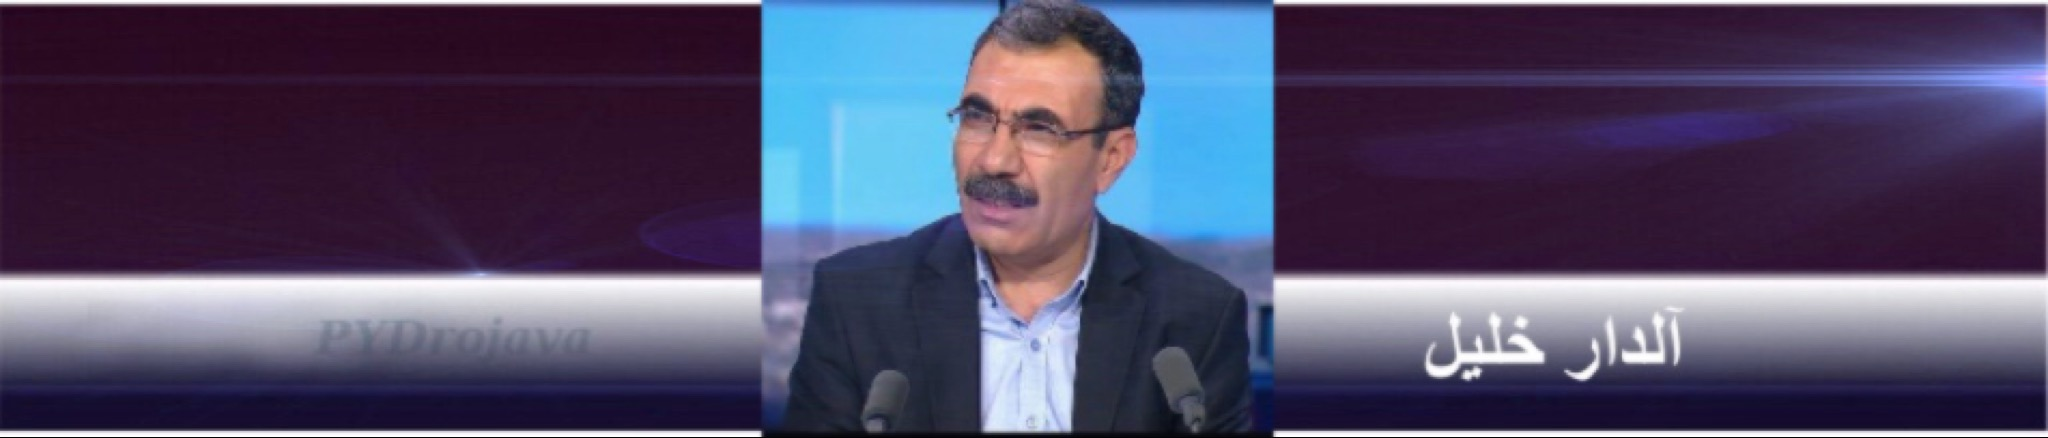 Photo of الظاهر والمخفيّ في مقاومة عفرين